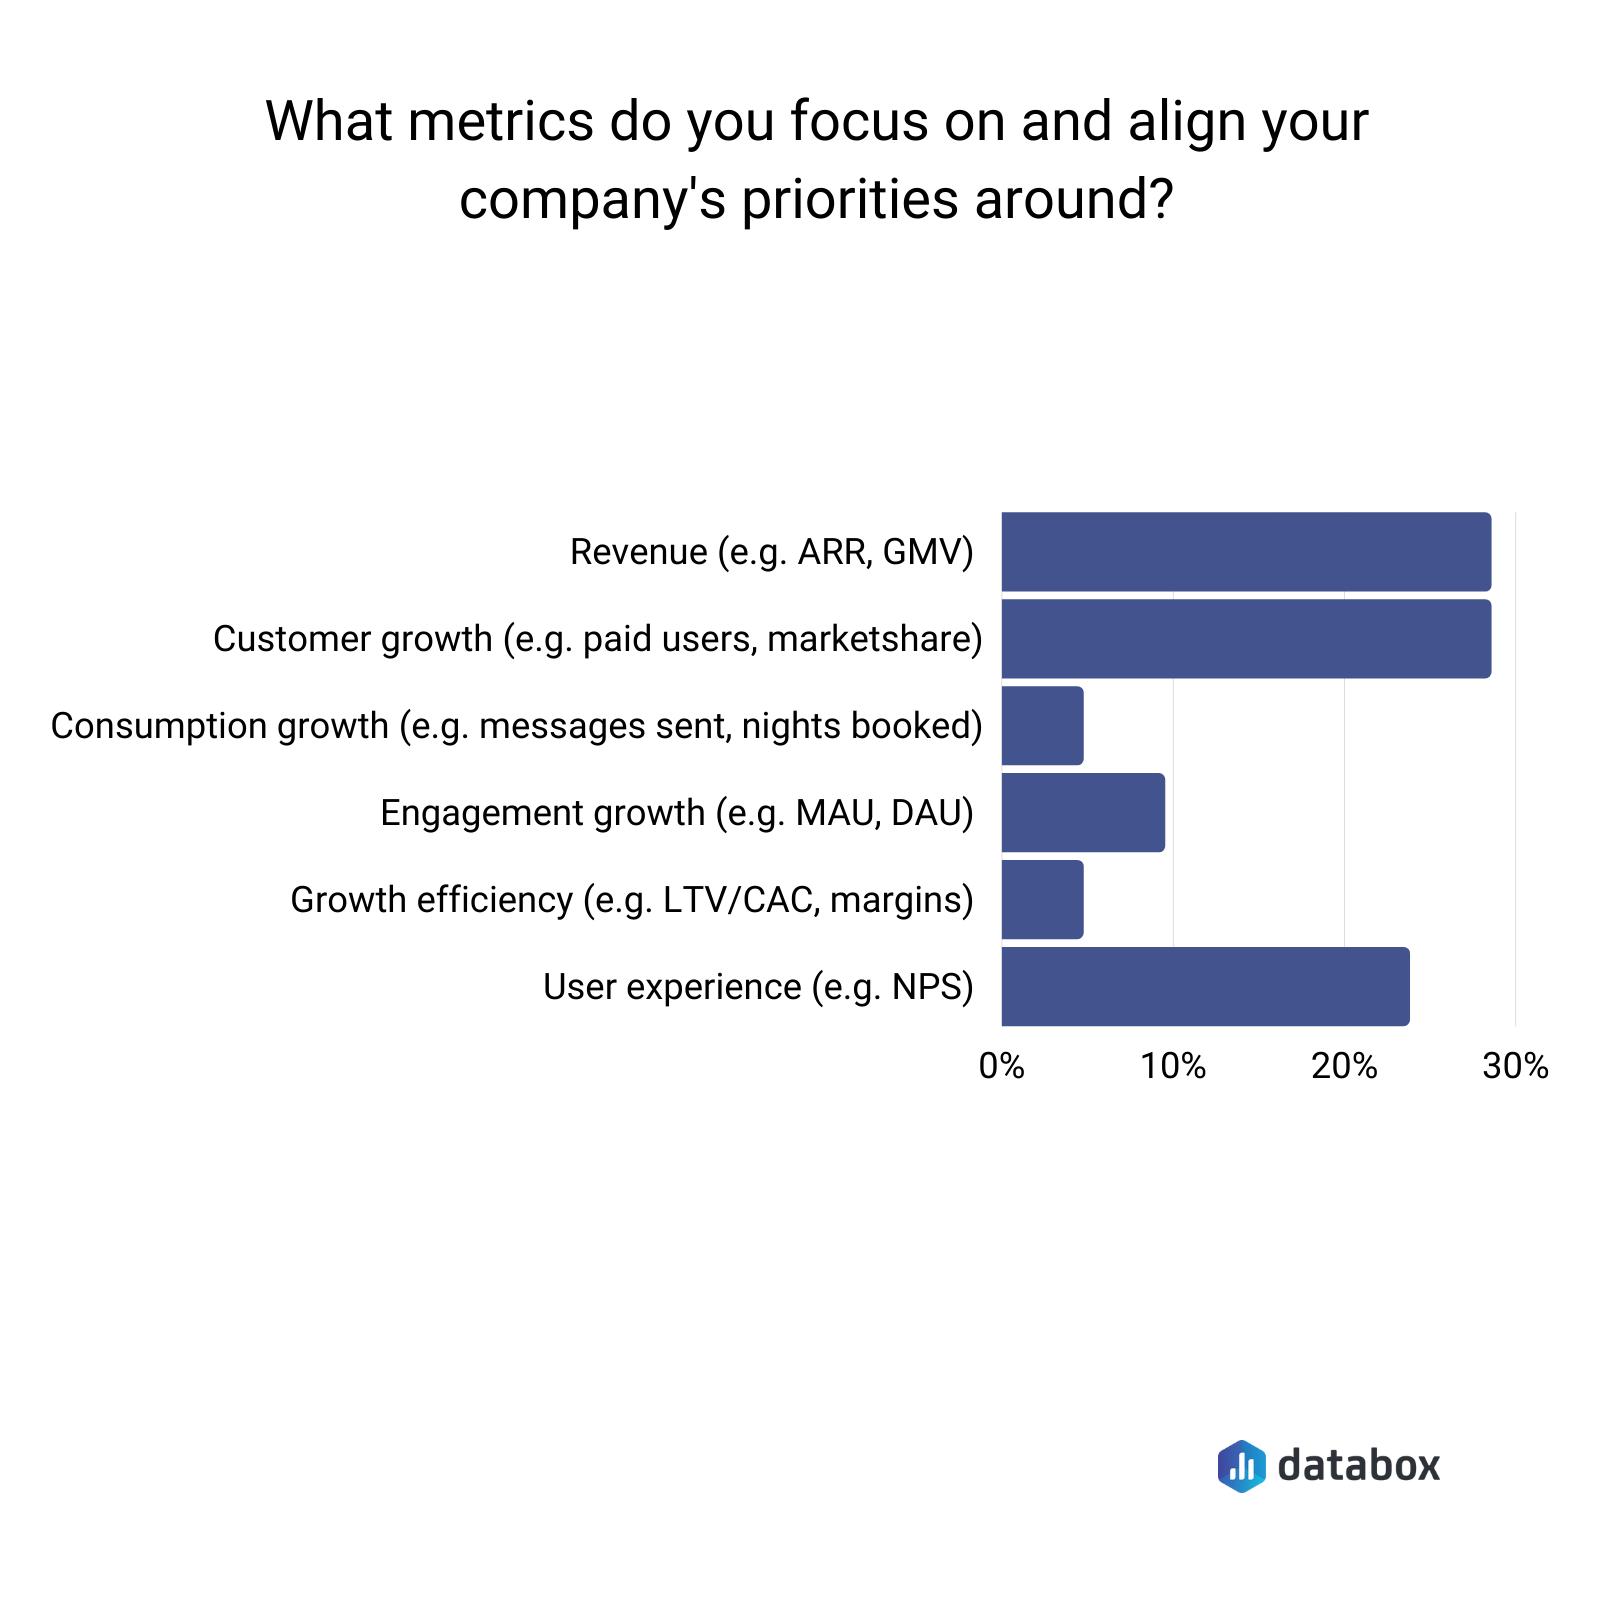 Metrics to align your company priorities around survey results